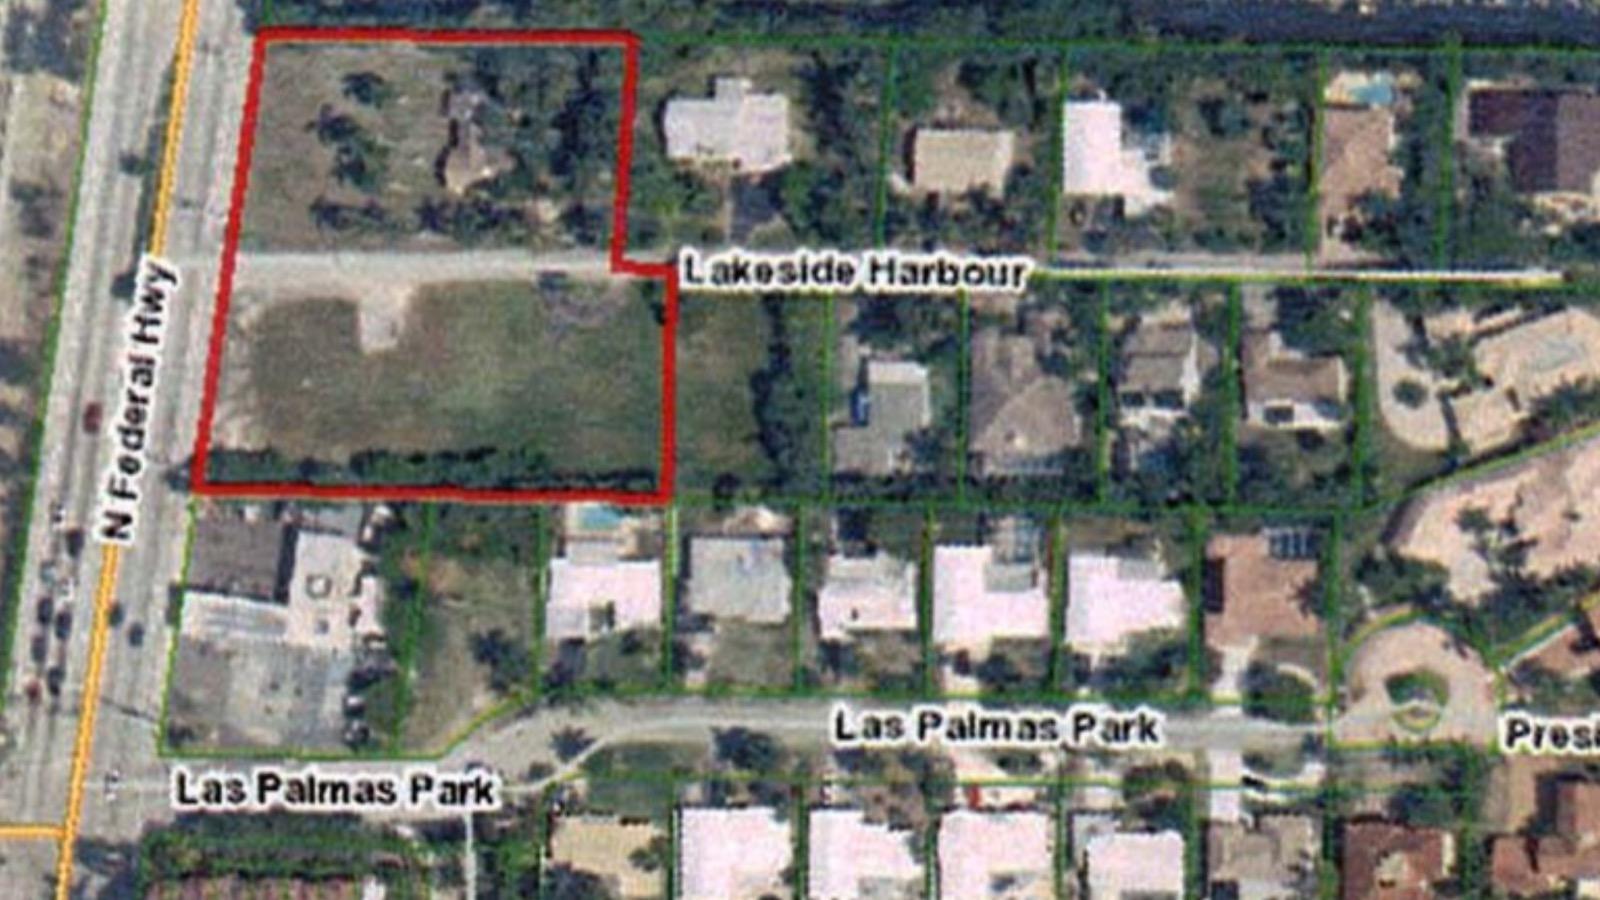 605 Lakeside Harbour Boynton Beach, FL 33435